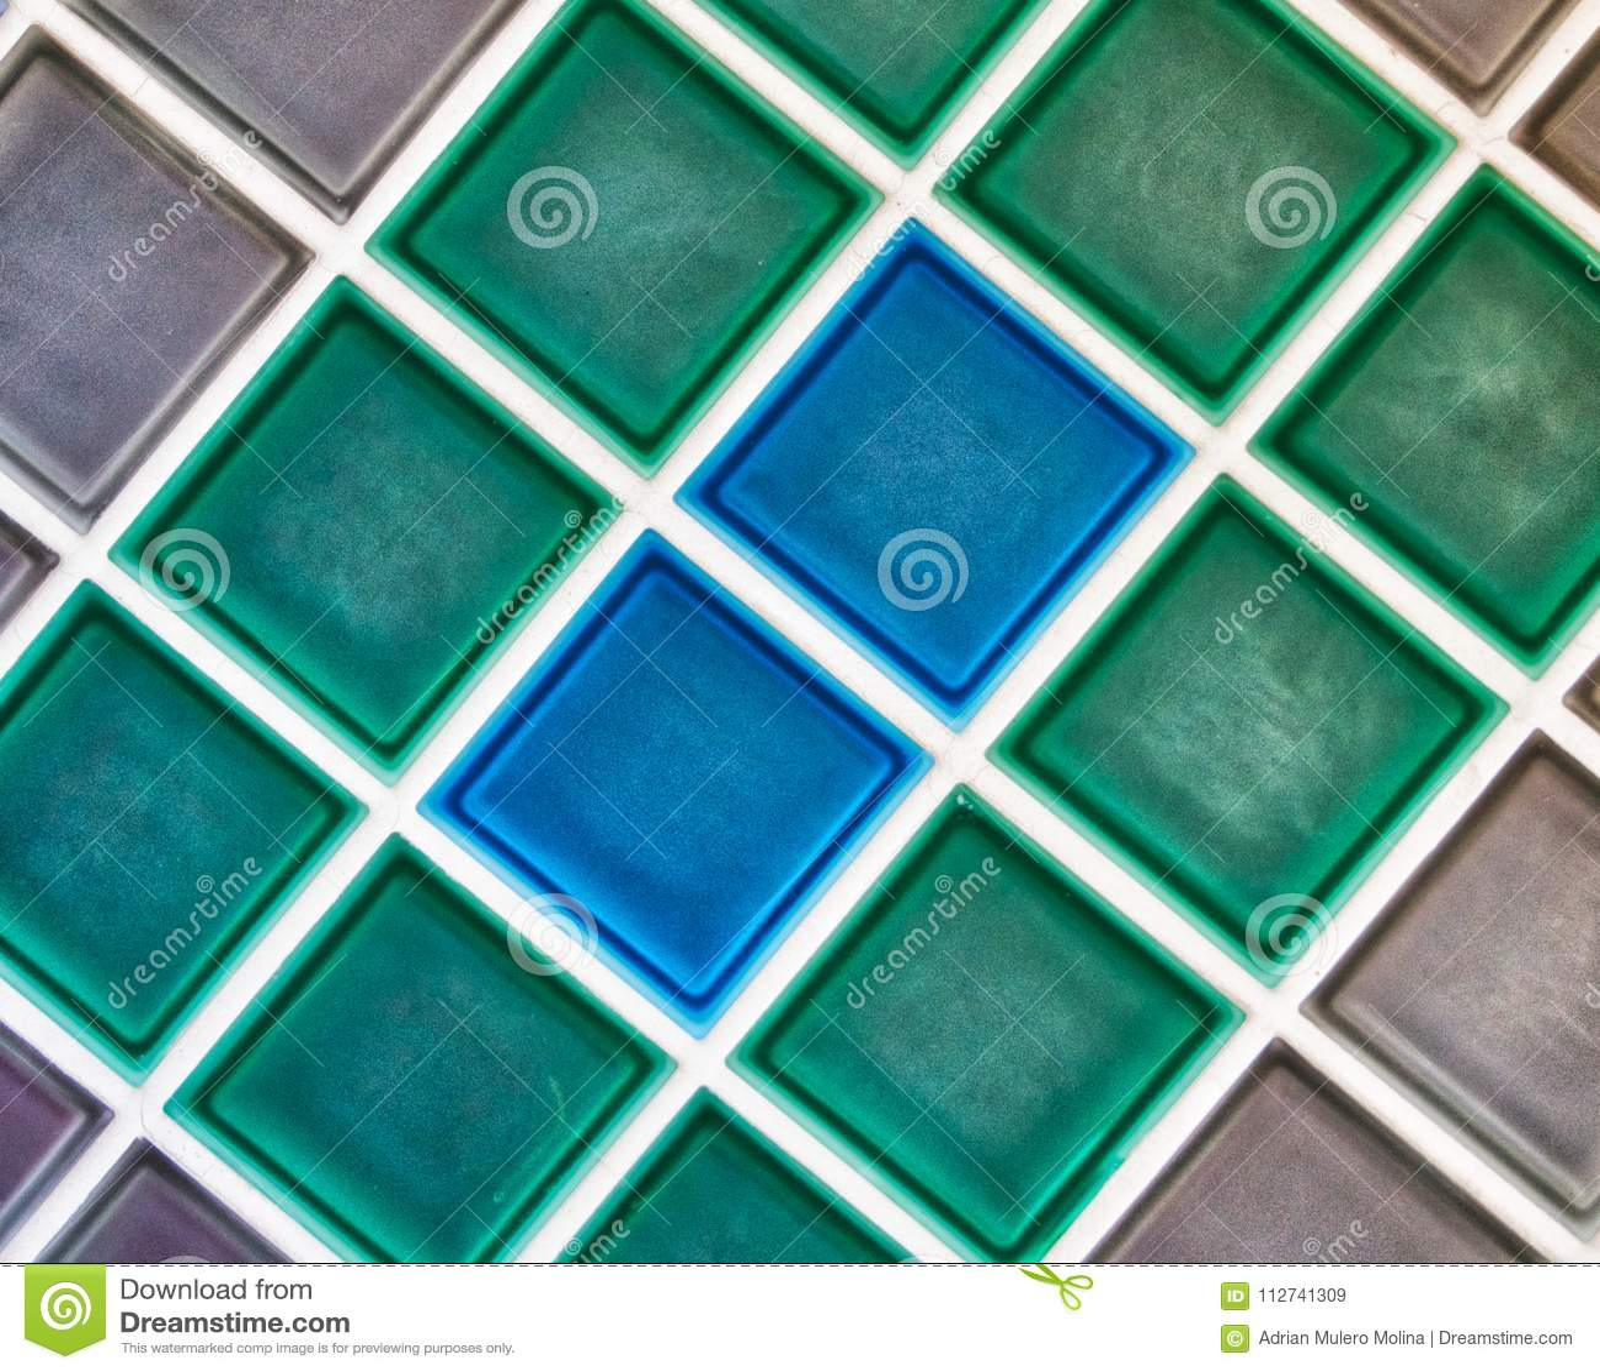 Wonderful Pattern And Colorful Mosaic Ceramic Tiles. Stock Image ...